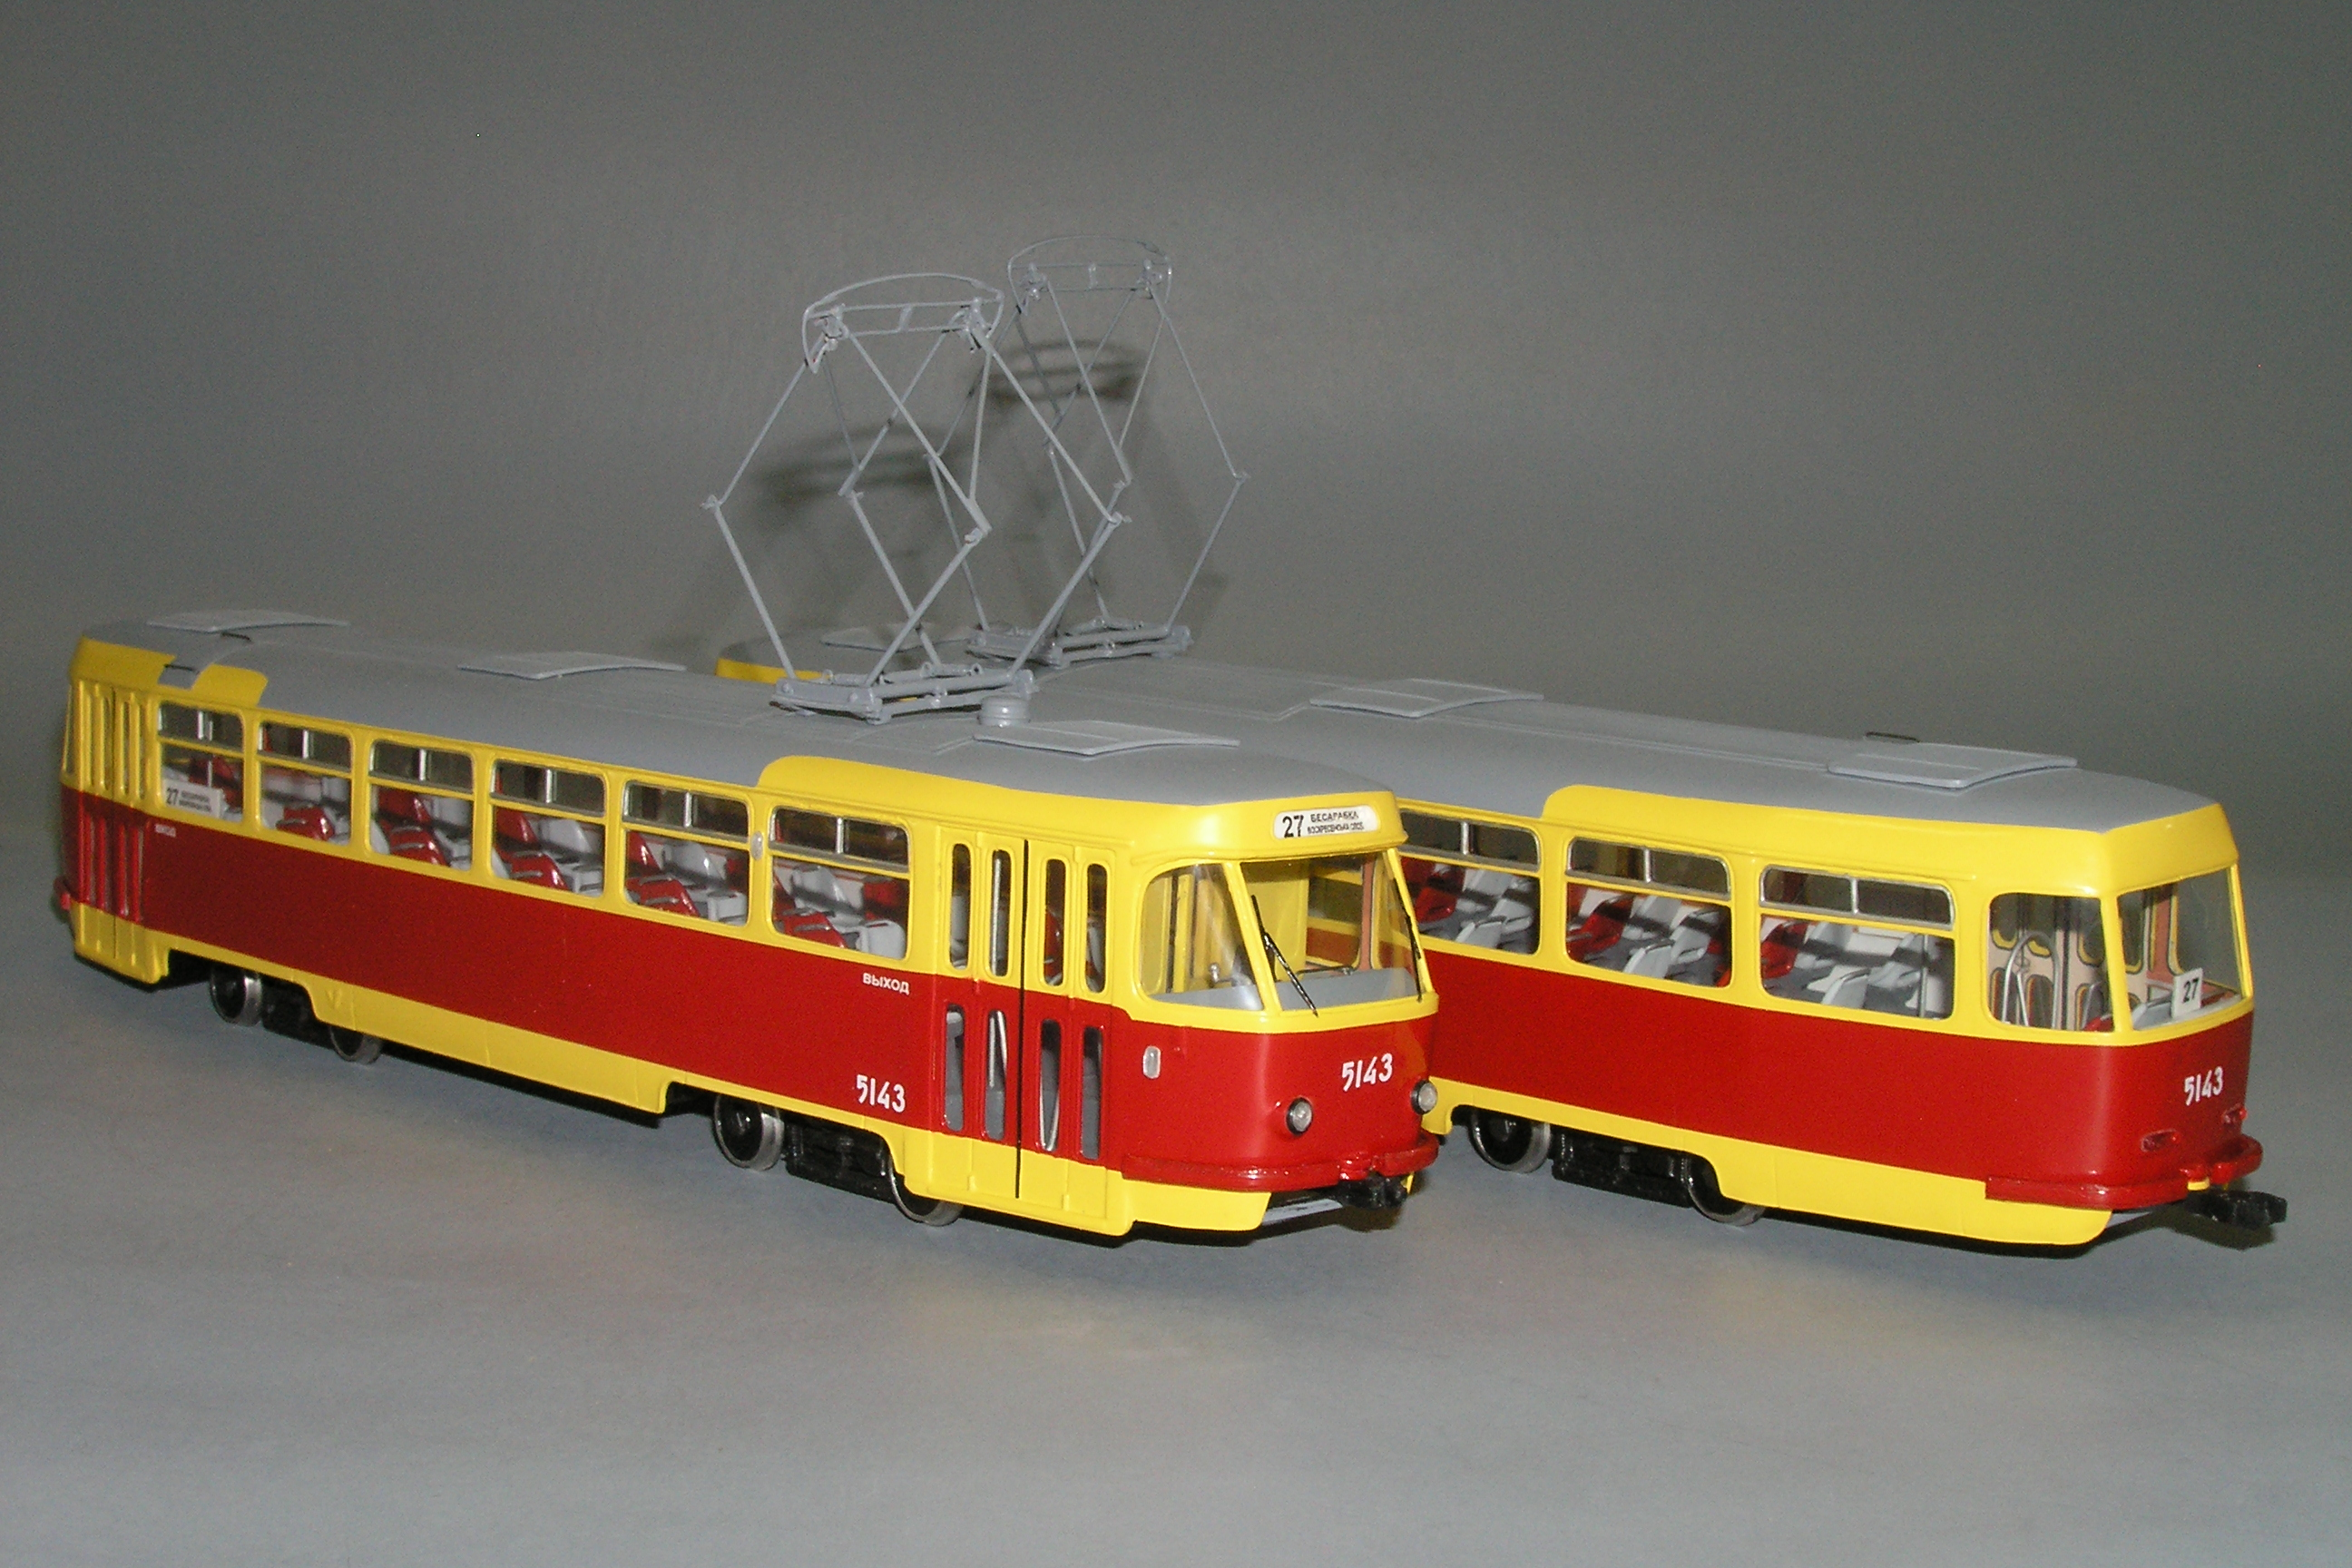 W5-82.4